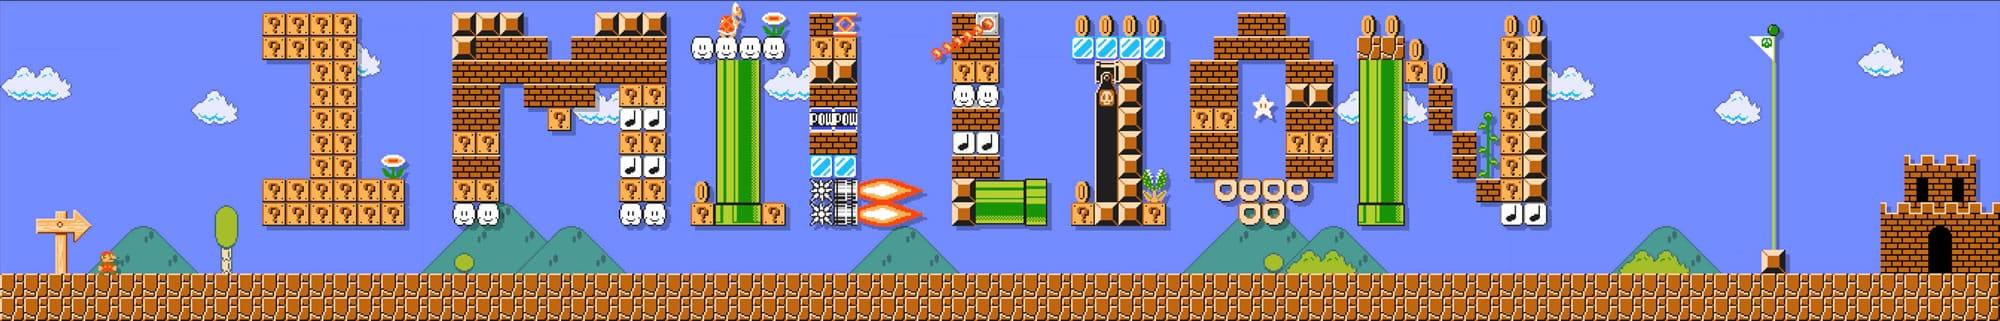 Super Mario Maker 1 millon ventas